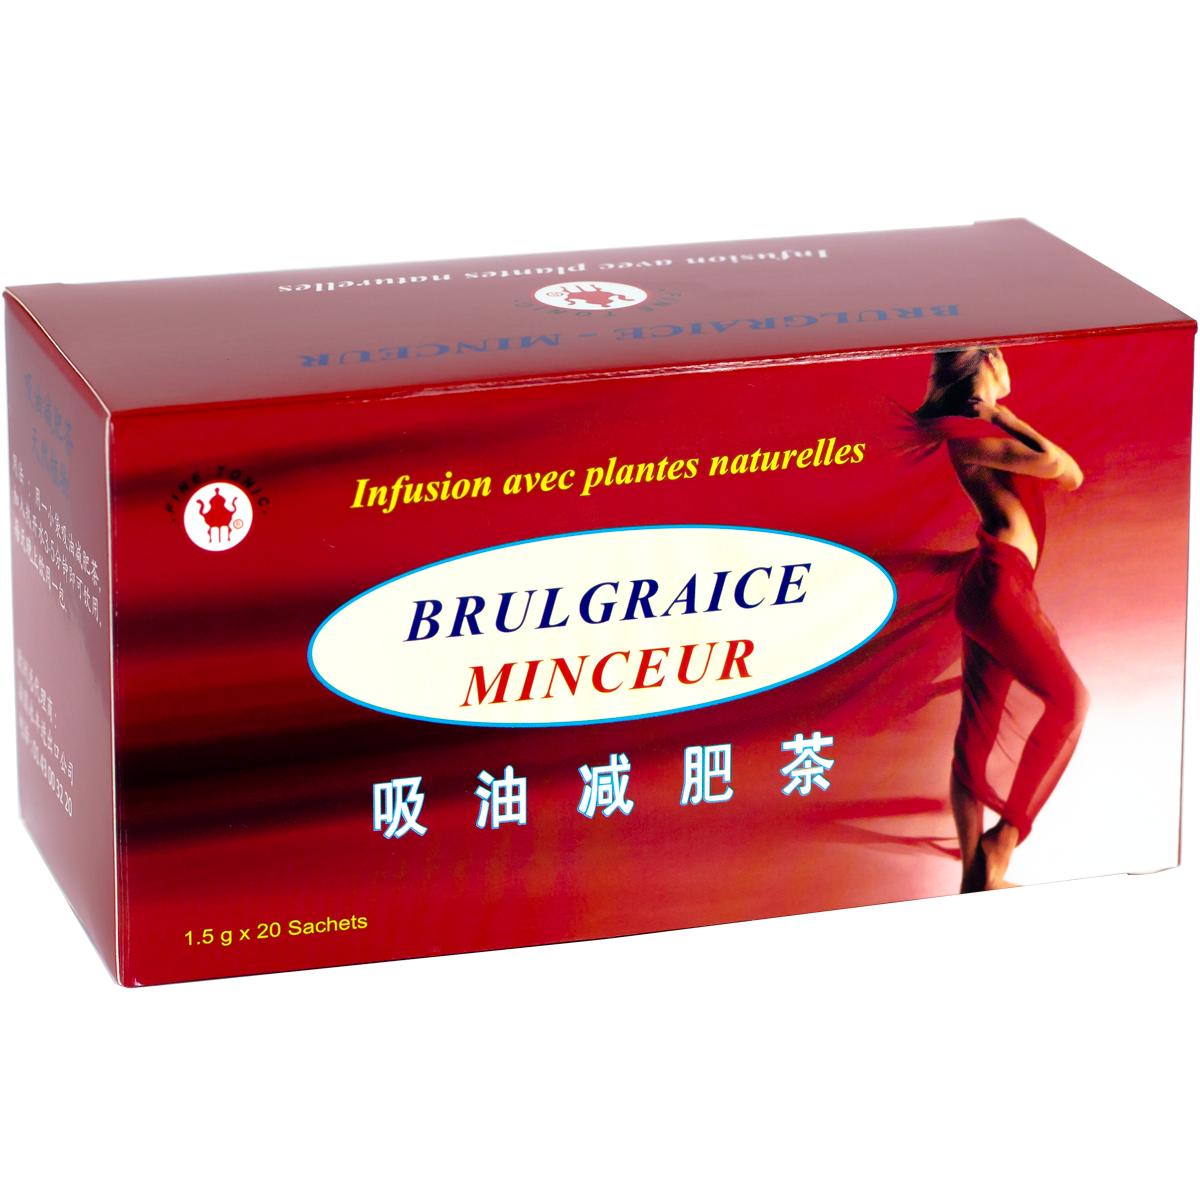 Brulgraice Minceur Image